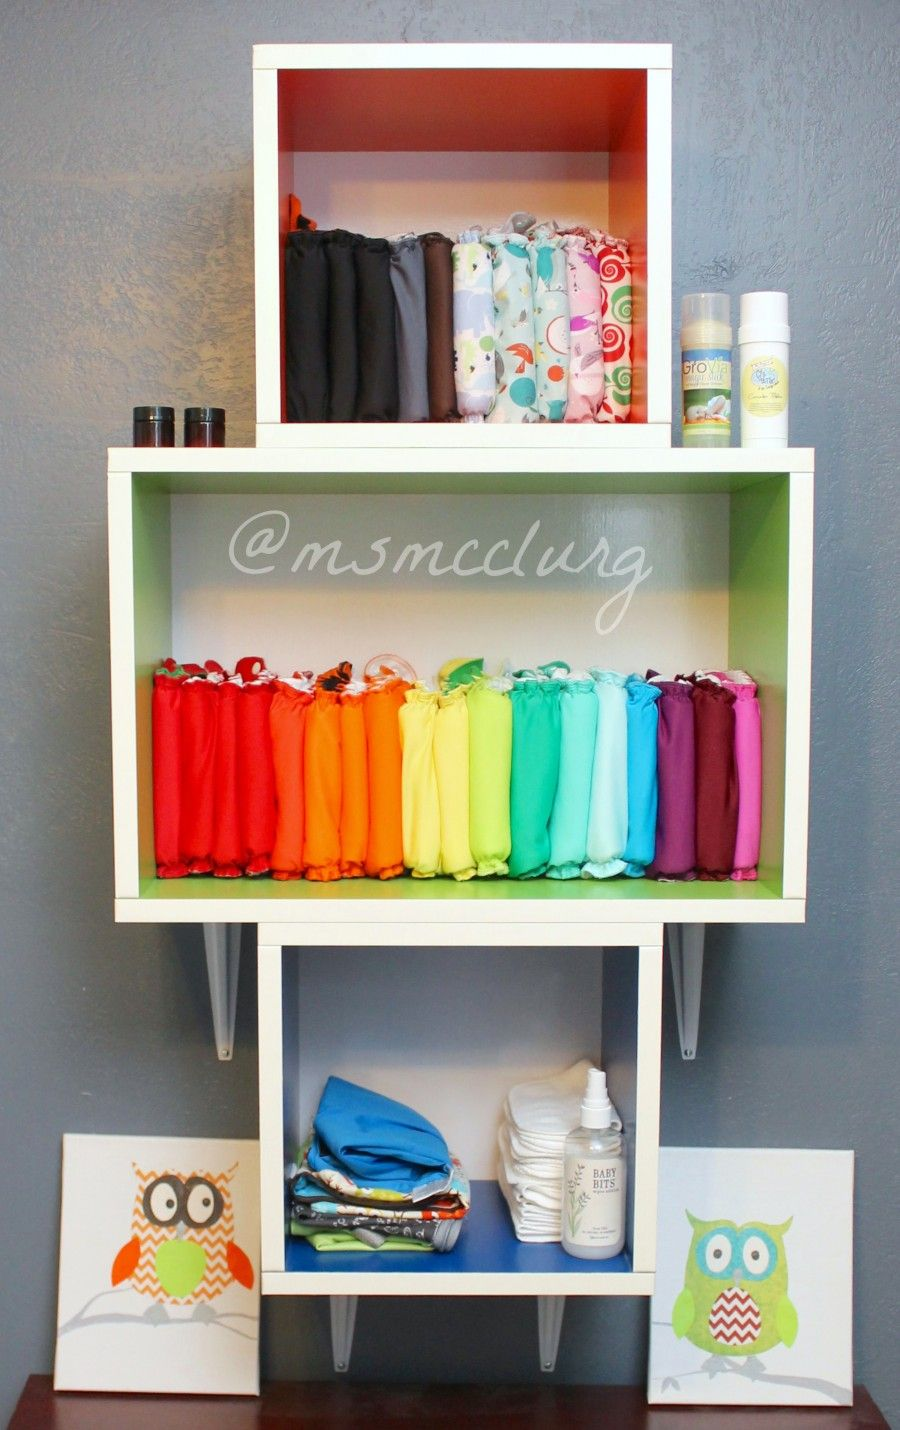 13 Inspired Cloth Diaper Storage Ideas Cloth Diaper Storage Diaper Storage Cloth Diaper Organization